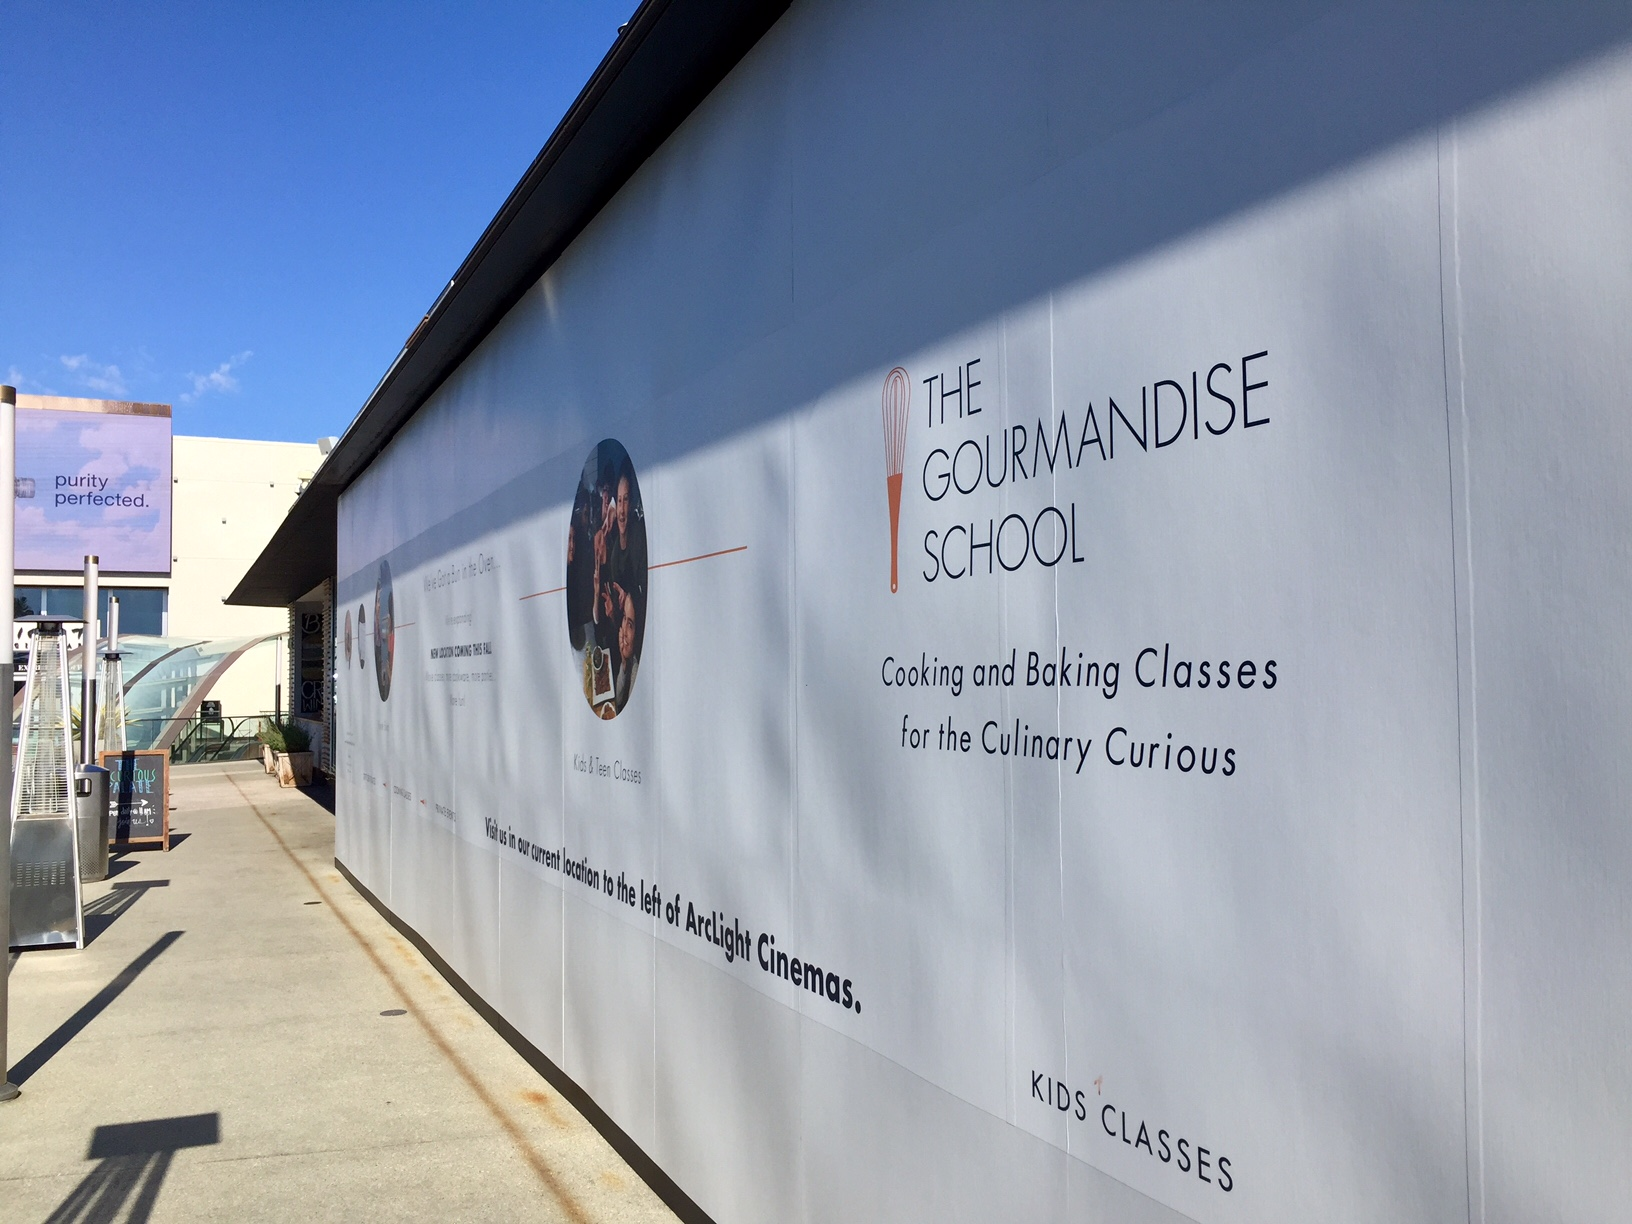 GourmandiseSchool.jpg